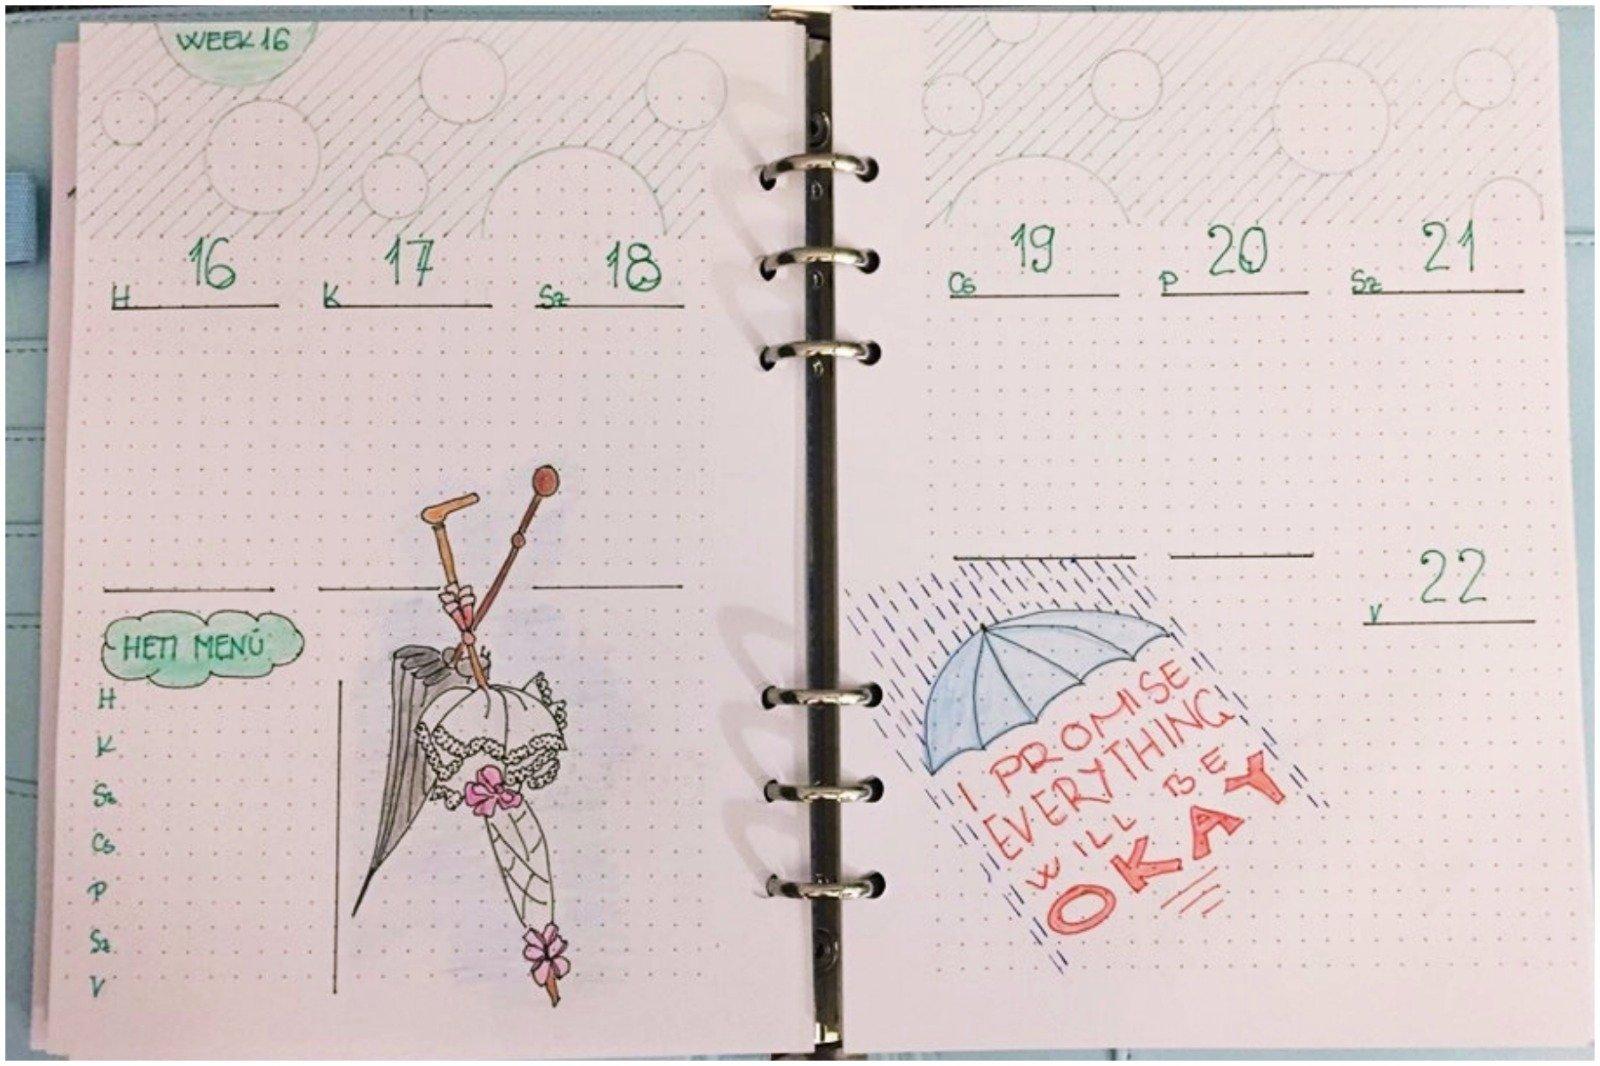 Bullet journal weekly planner - week 16 - itstartswithacoffee.com #april #coverpage #bulletjournal #bujo #weekly #weeklyplanner #bulletjournaling #bujojunkies #bujolove #showmeyourplanner #bujoinspire #bulletjournallove #bulletjournalcommunity #planning #planneraddict #bulletjournaljunkies #planwithme #itstartswithacoffee.com